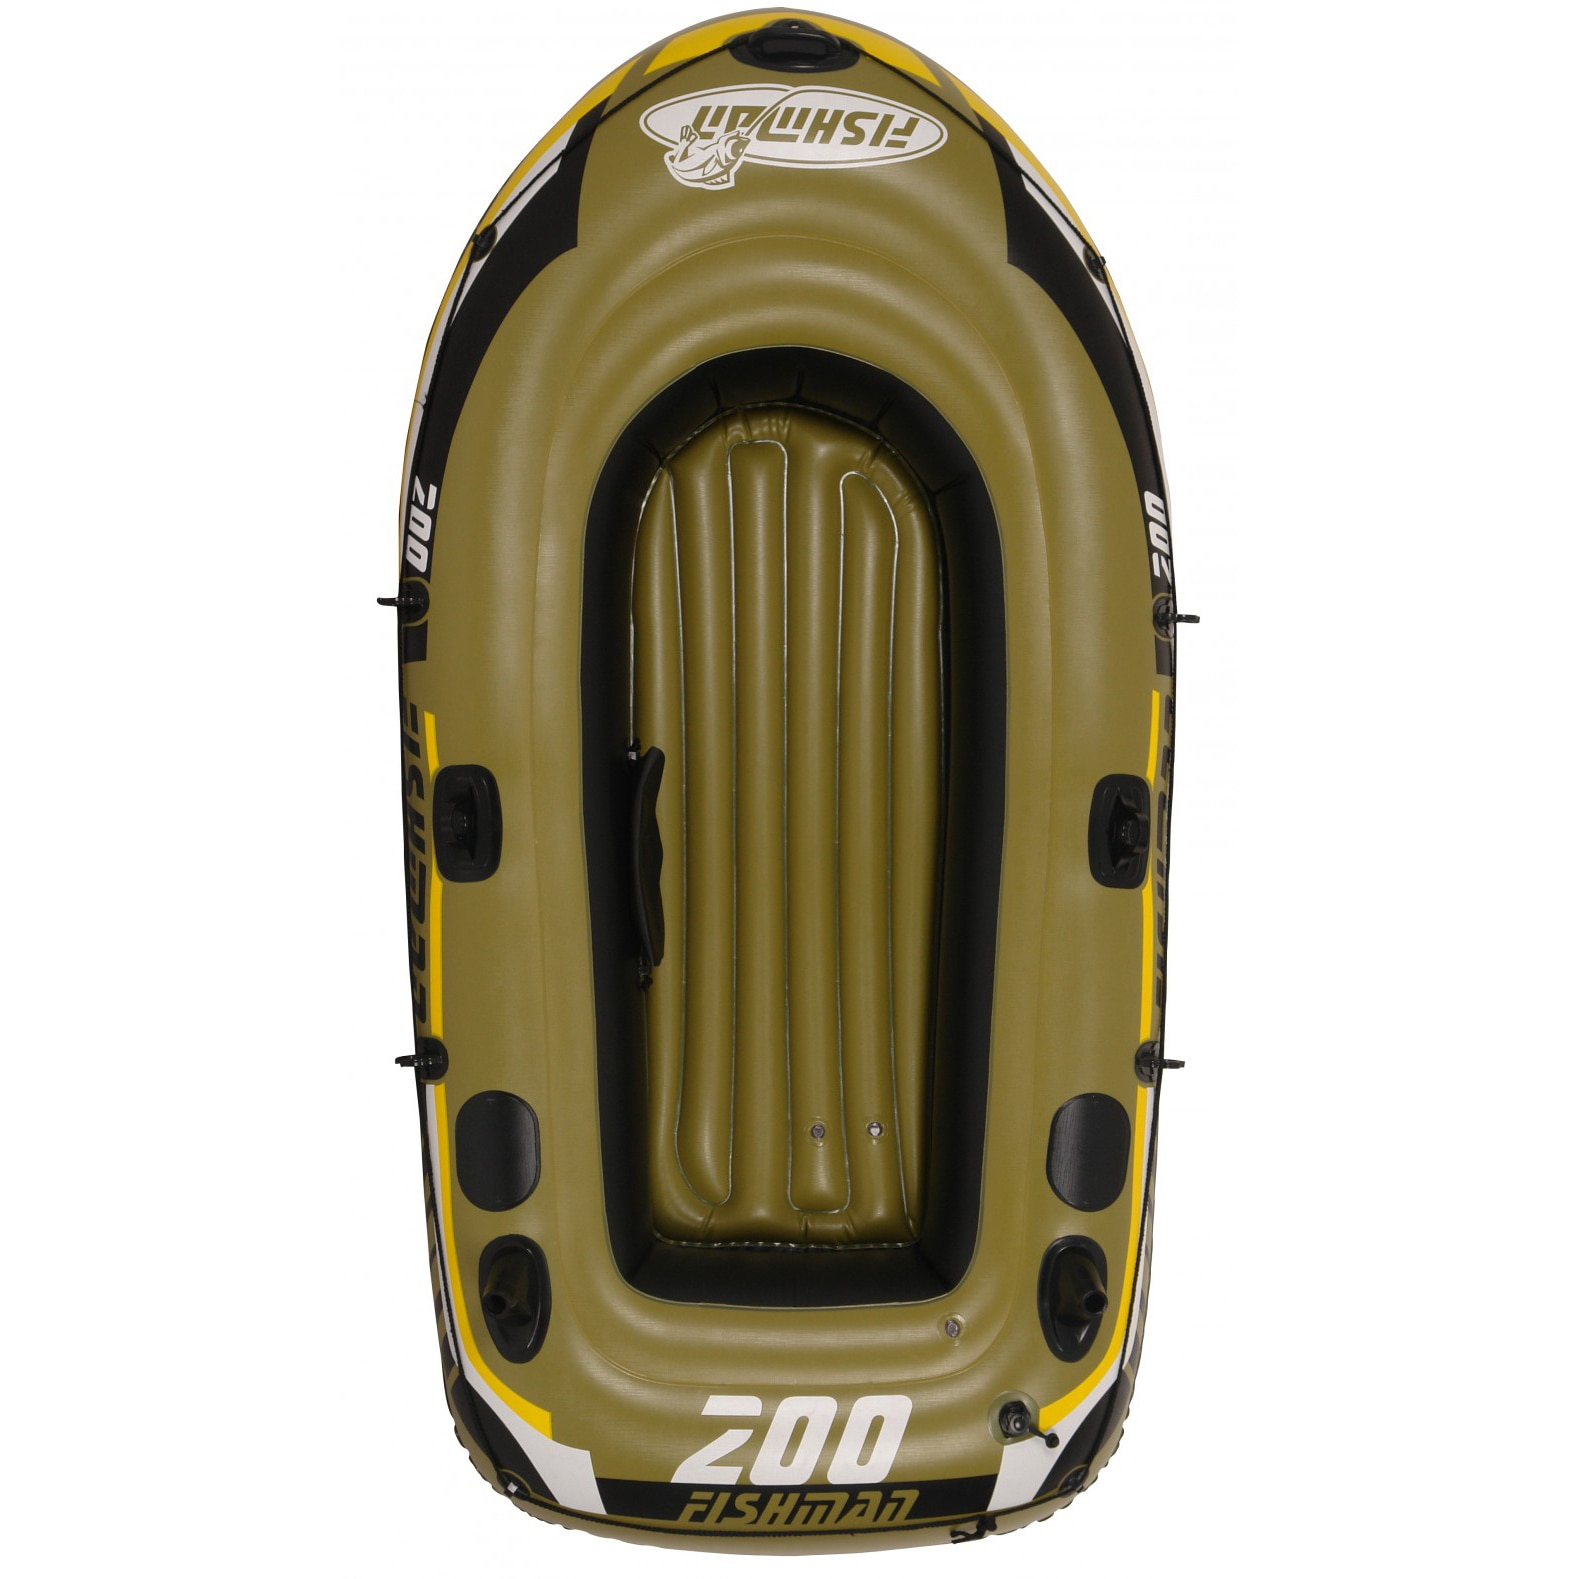 Fotografie Barca gonflabila Fishman 200, 218*110*36 cm, cu pompa si vasle incluse